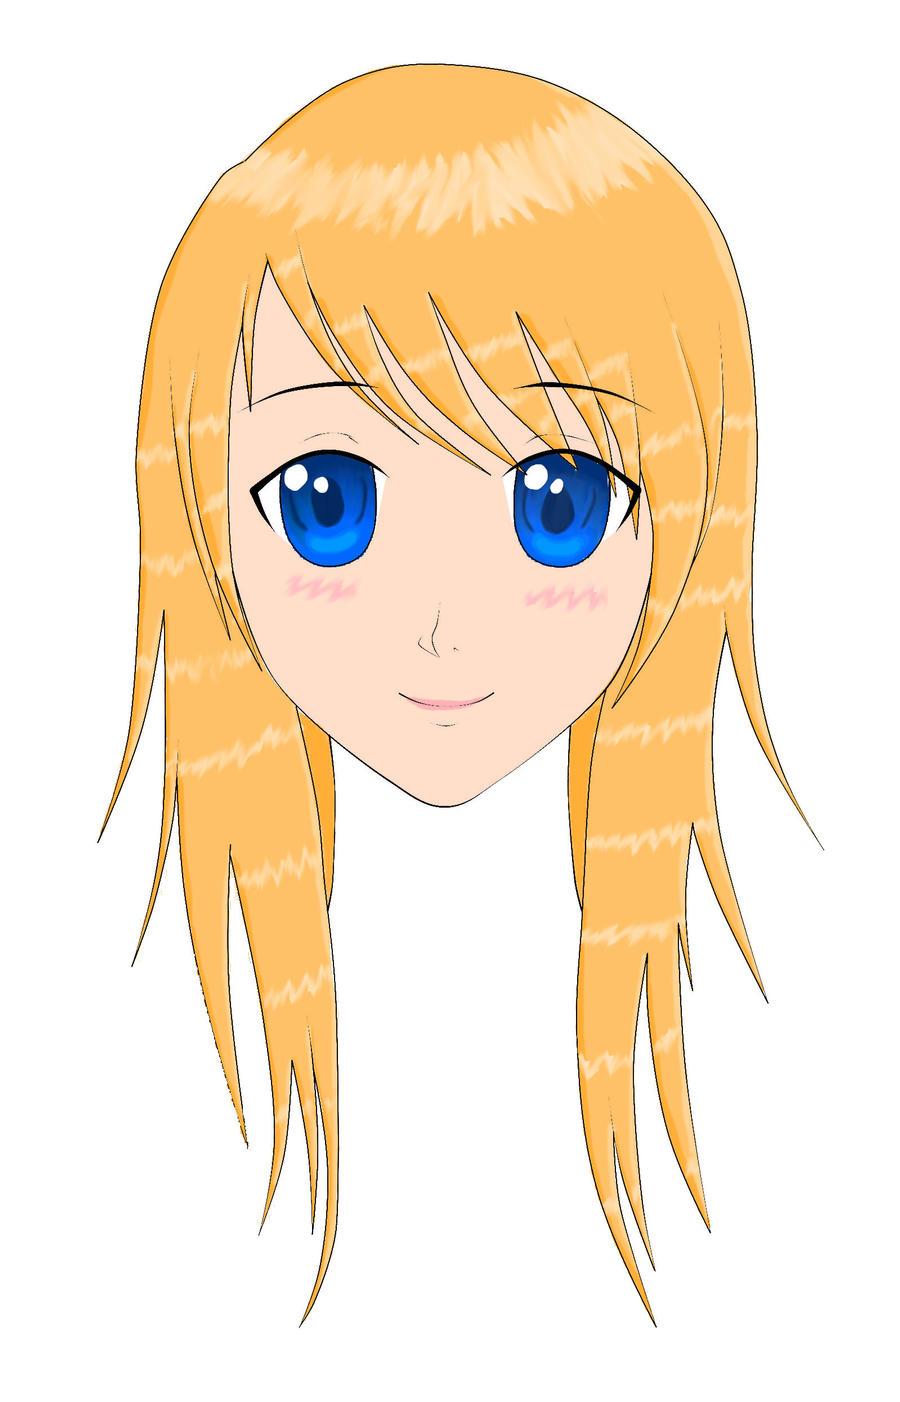 Orange hair blue eyed anime girl by Glissel on DeviantArt